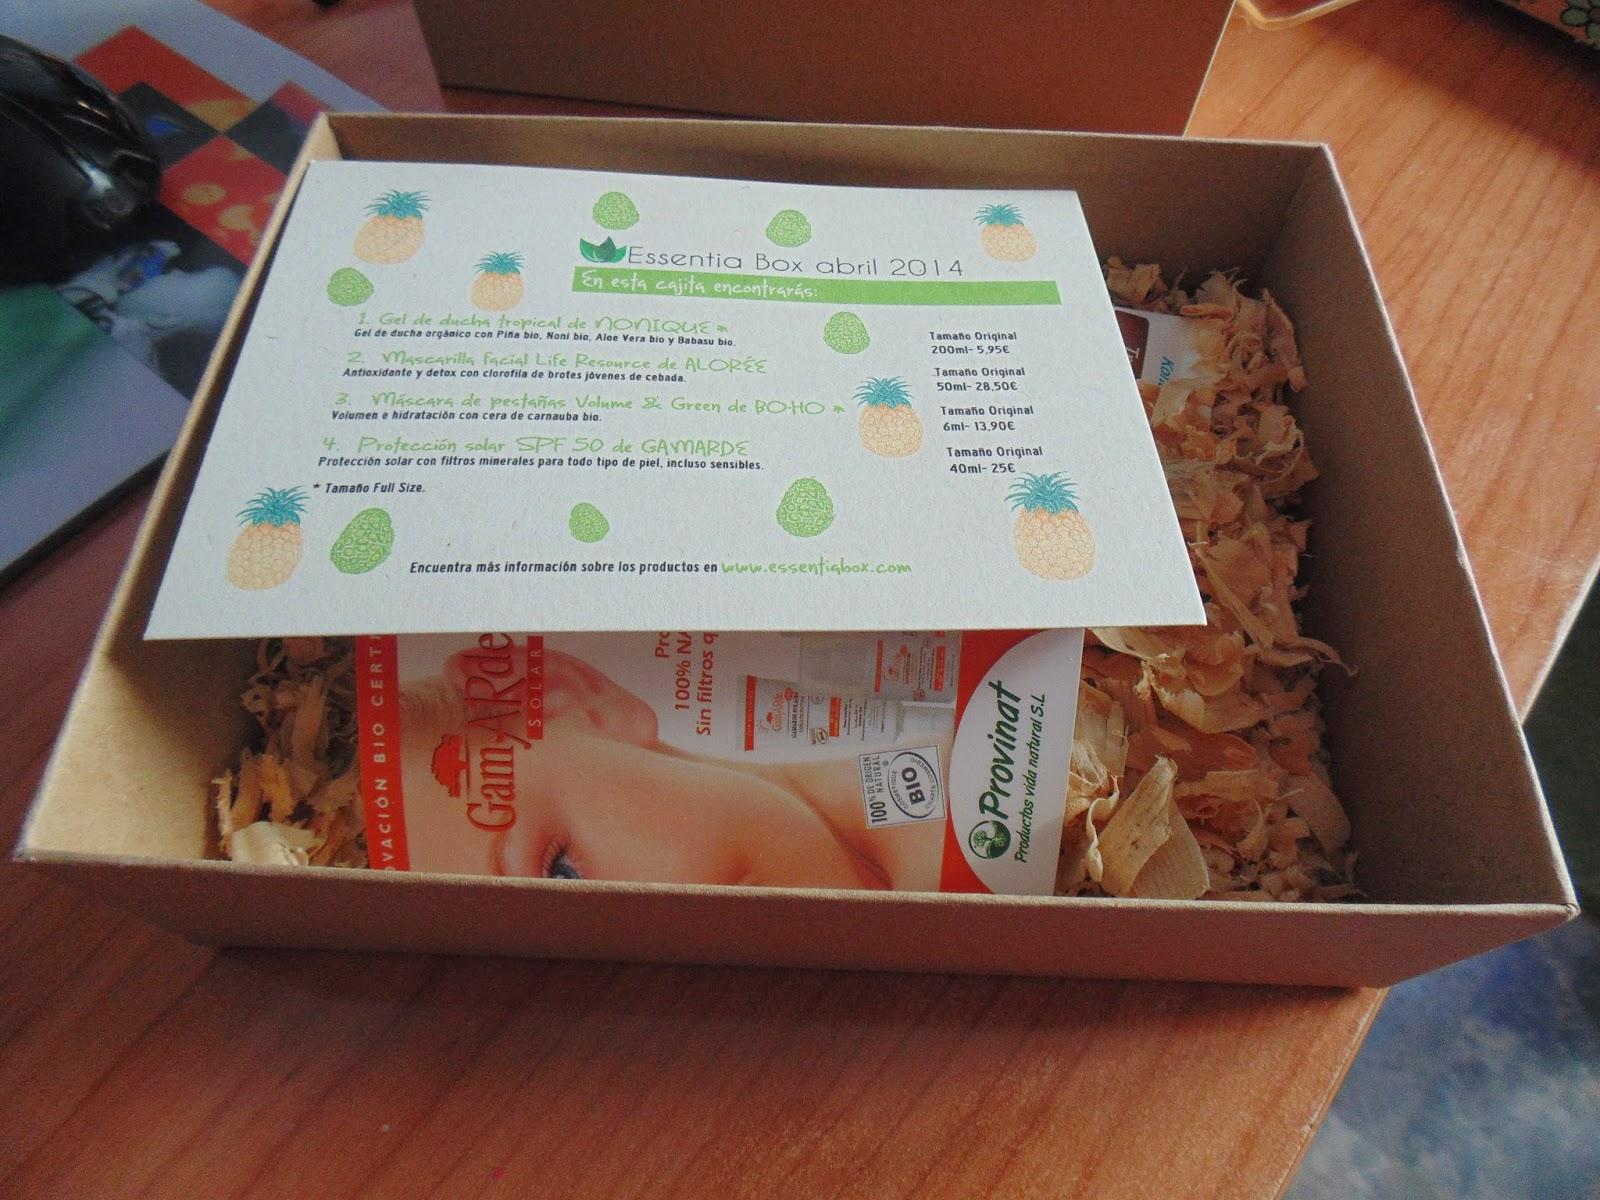 Essentia Box Abril 2